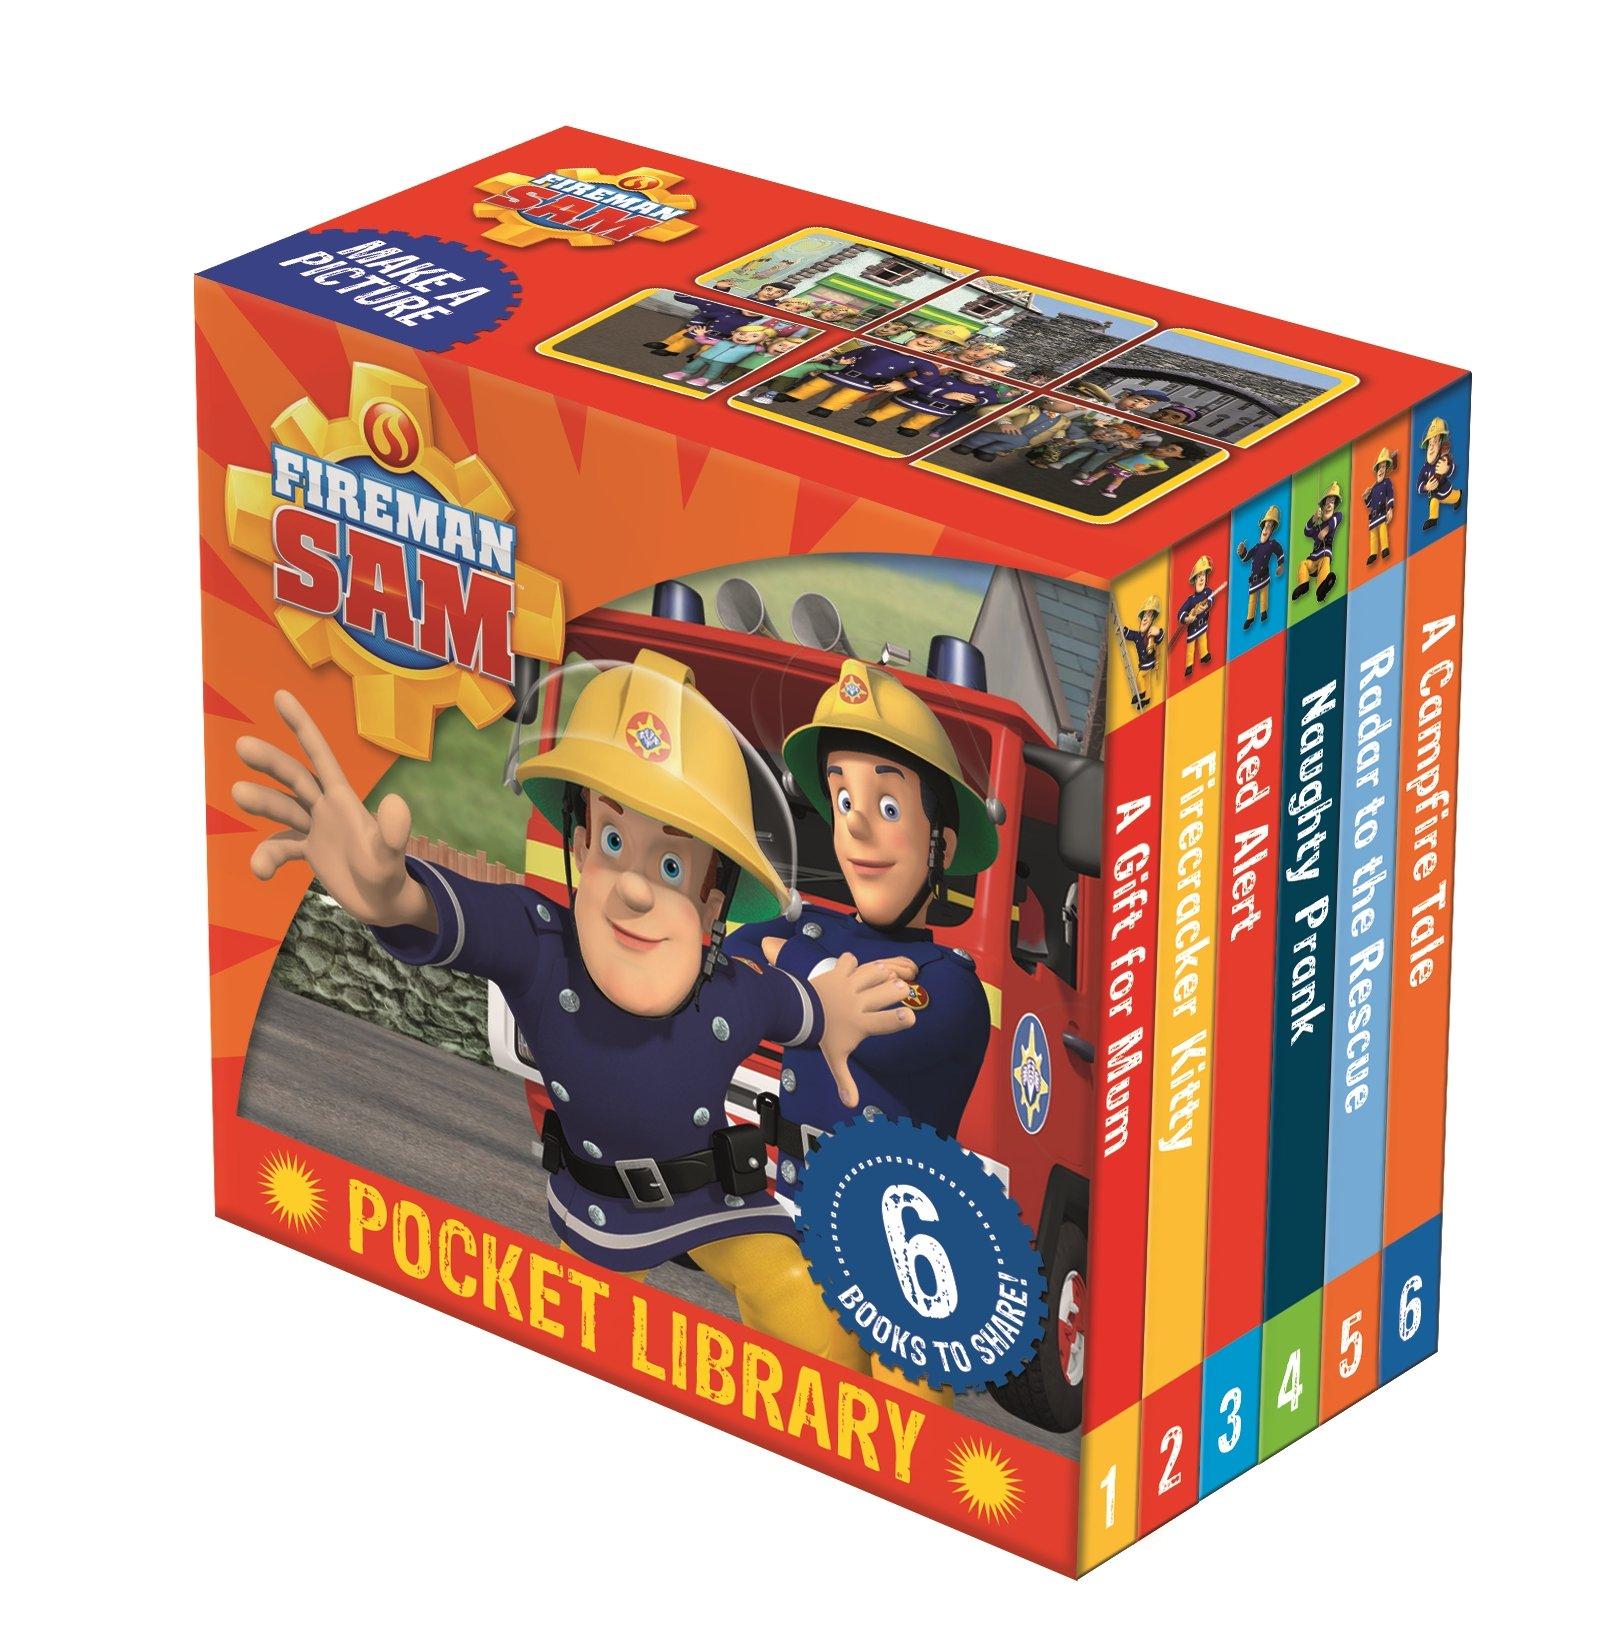 Download Fireman Sam Pocket Library pdf epub